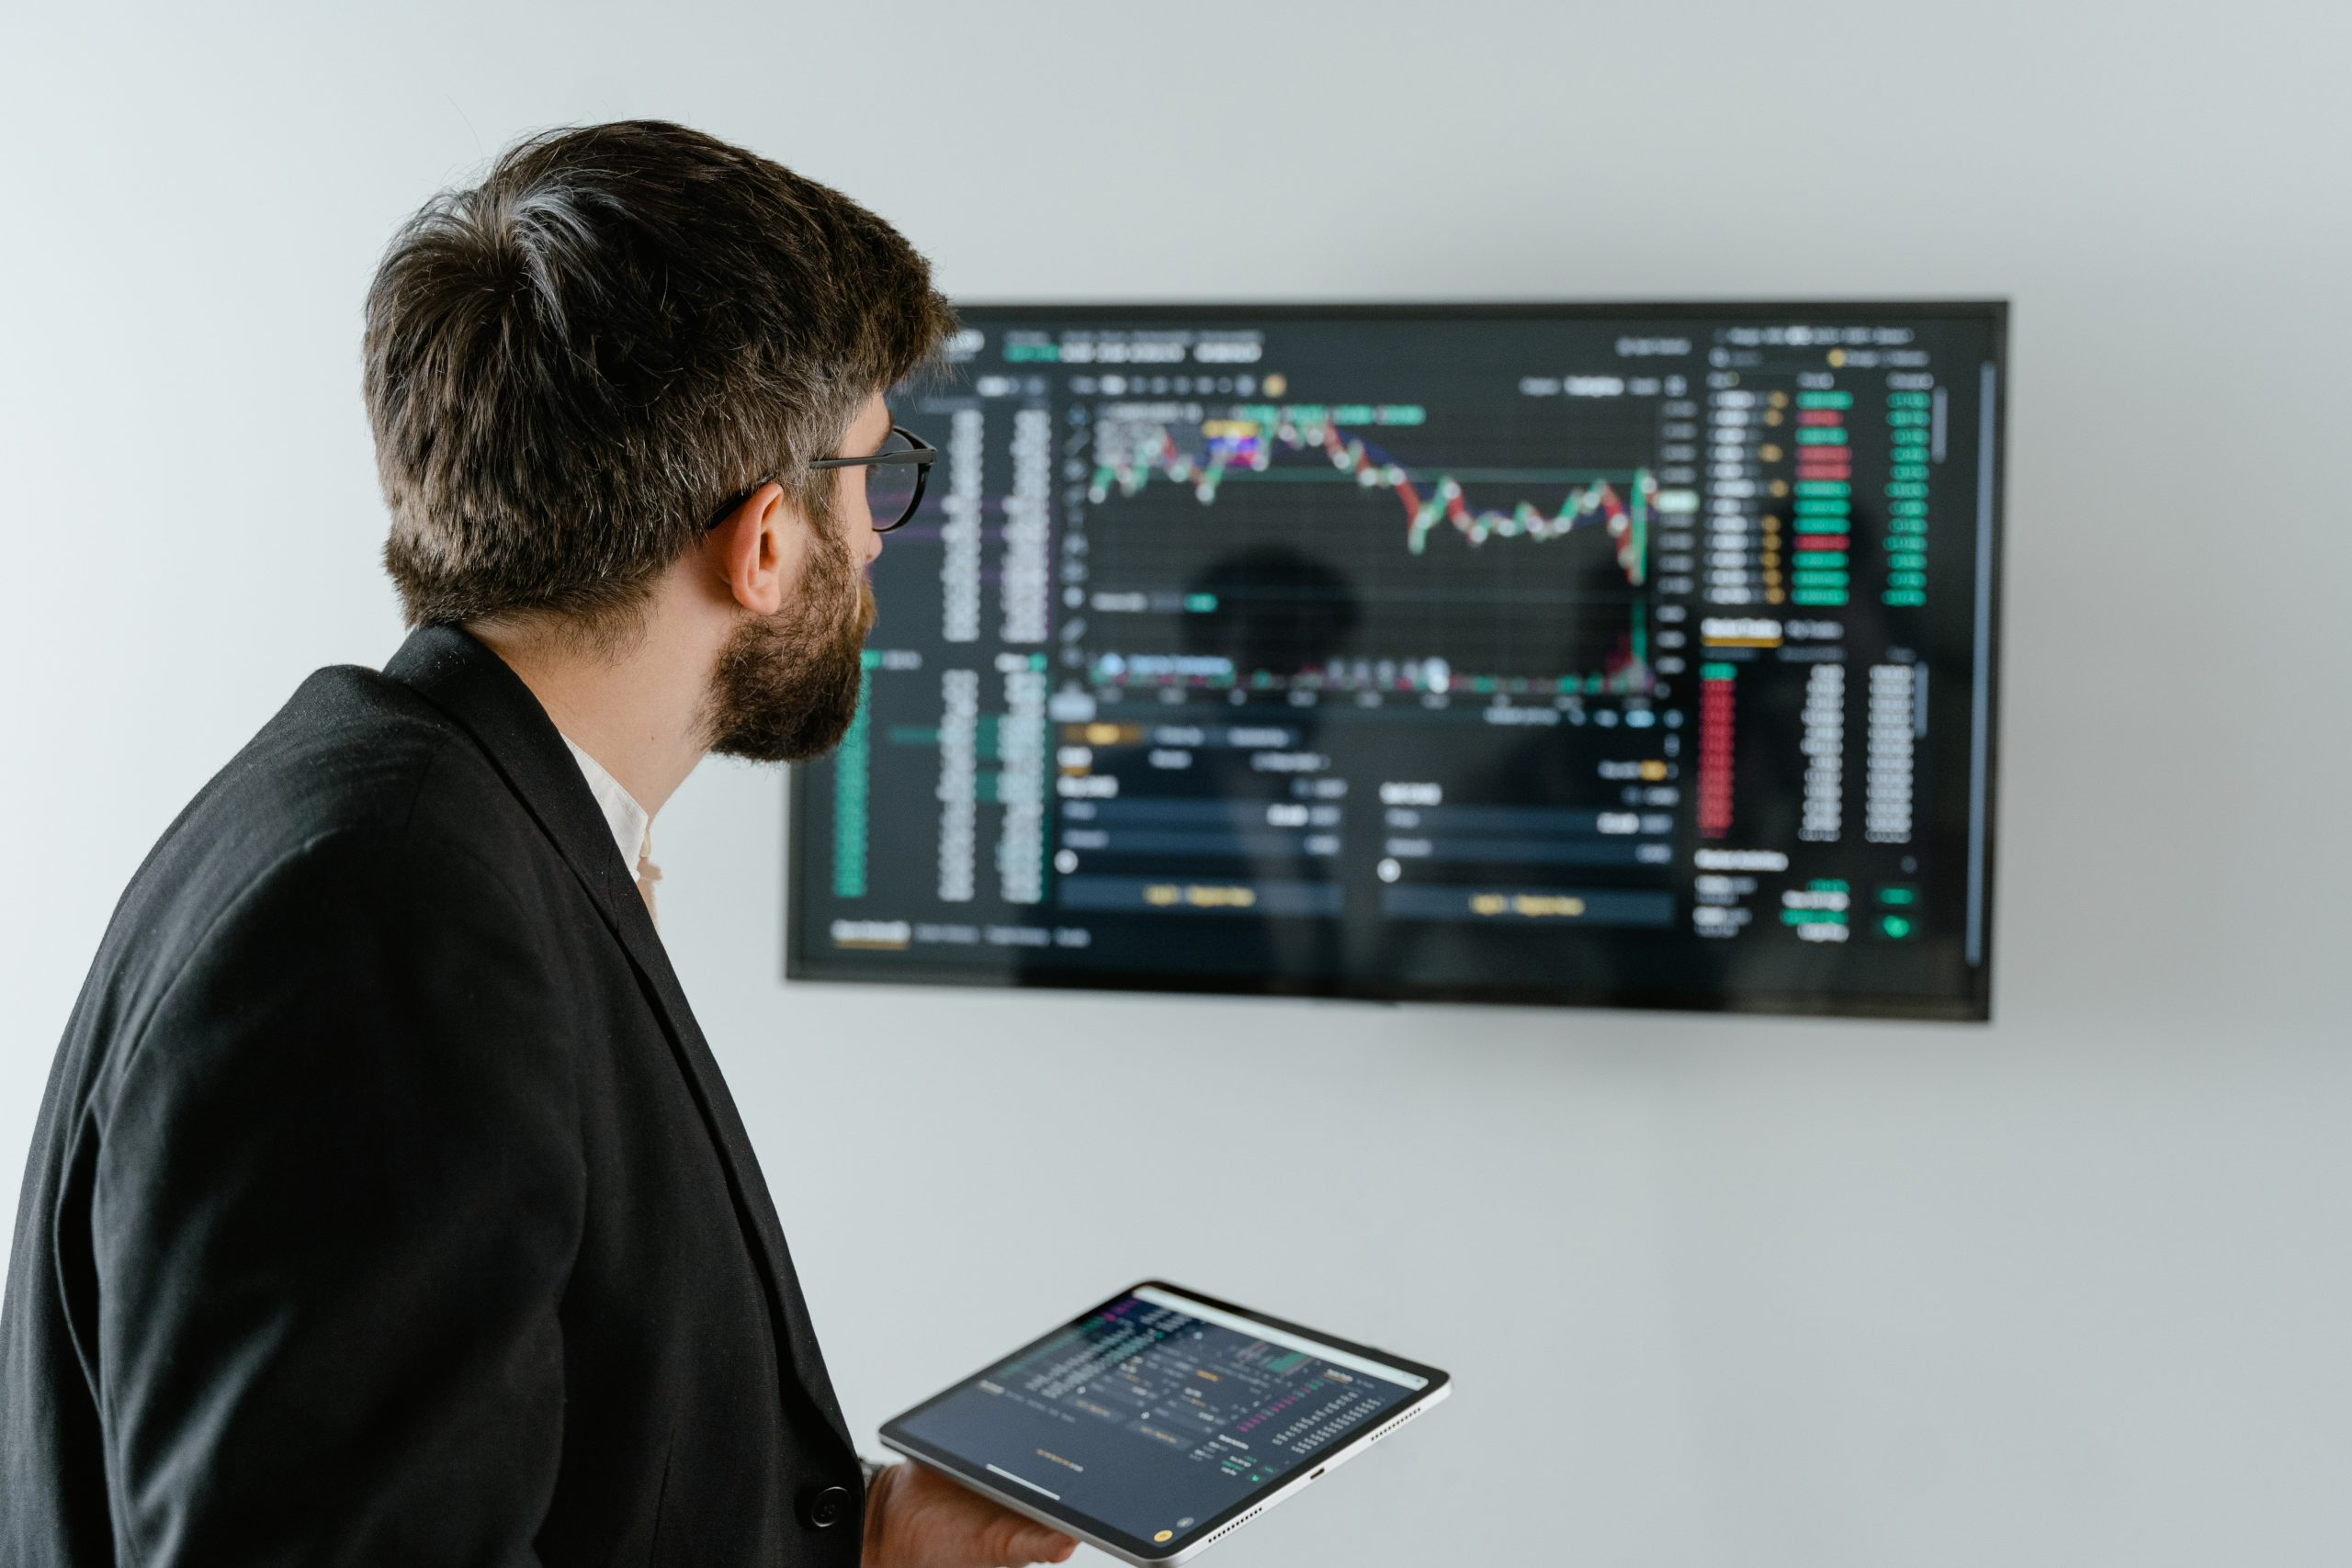 Meet Daniel: a Data Analyst on a Leading Insurance Organisation's Digital Transformation Programme